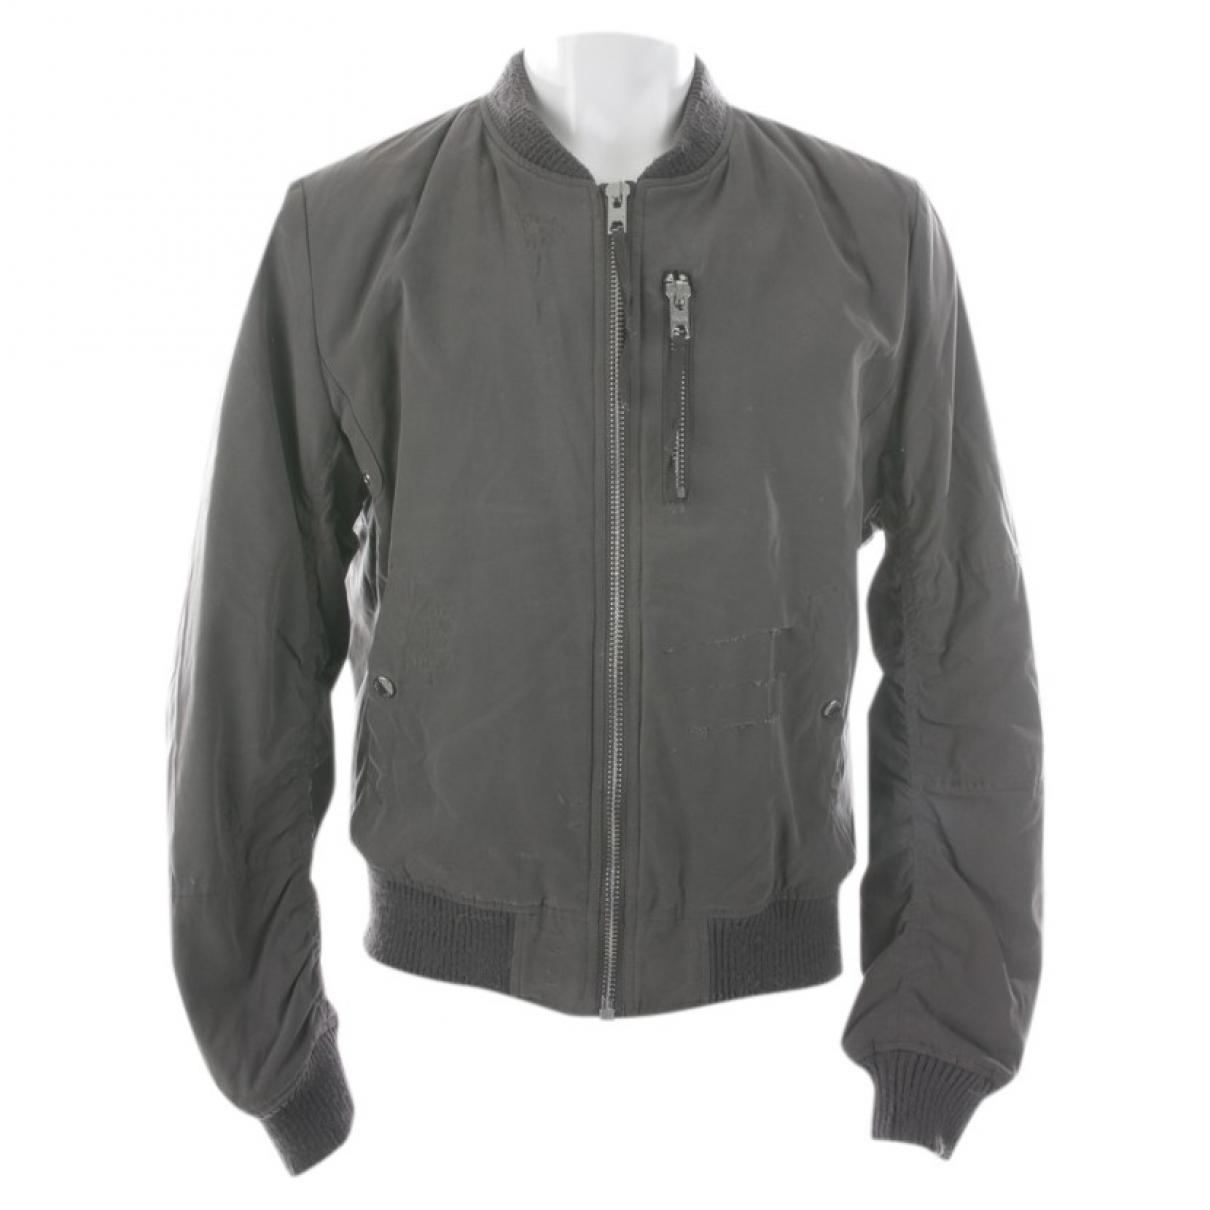 Autre Marque \N Grey Cotton jacket for Women L International